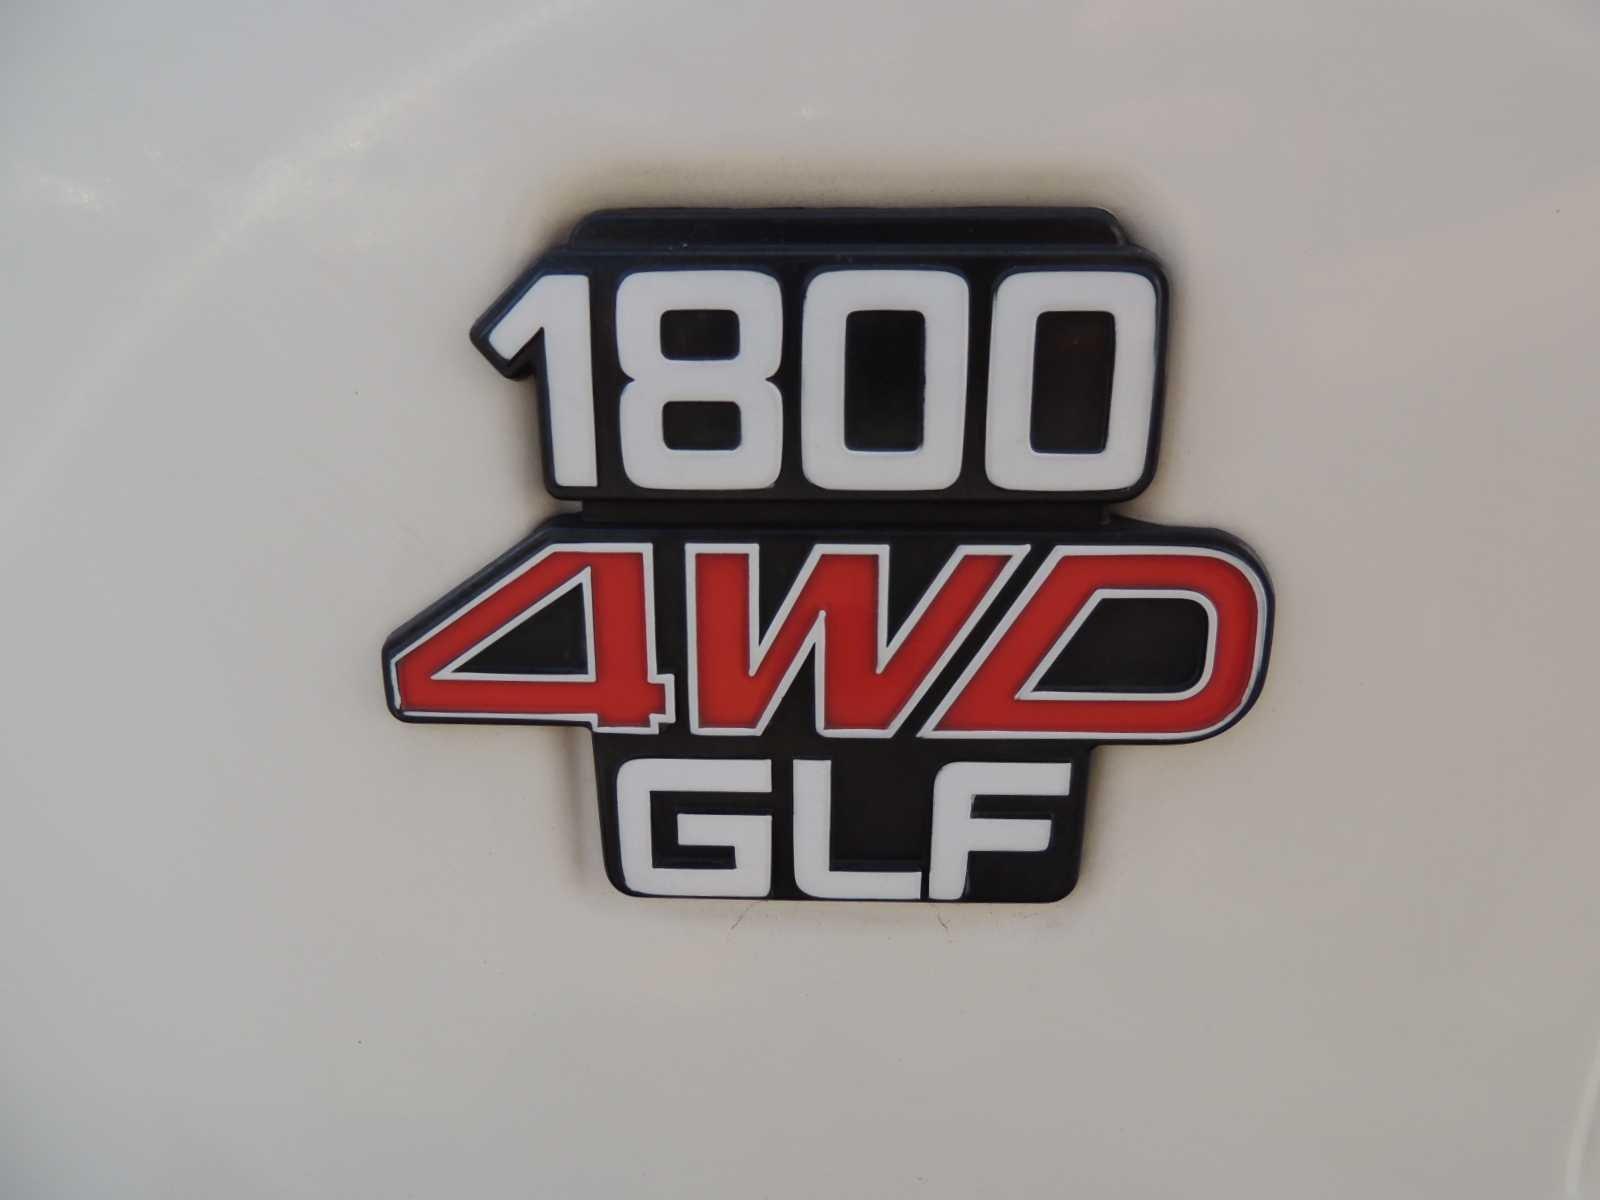 Subaru 1800 GLF 4WD 1983 (6)